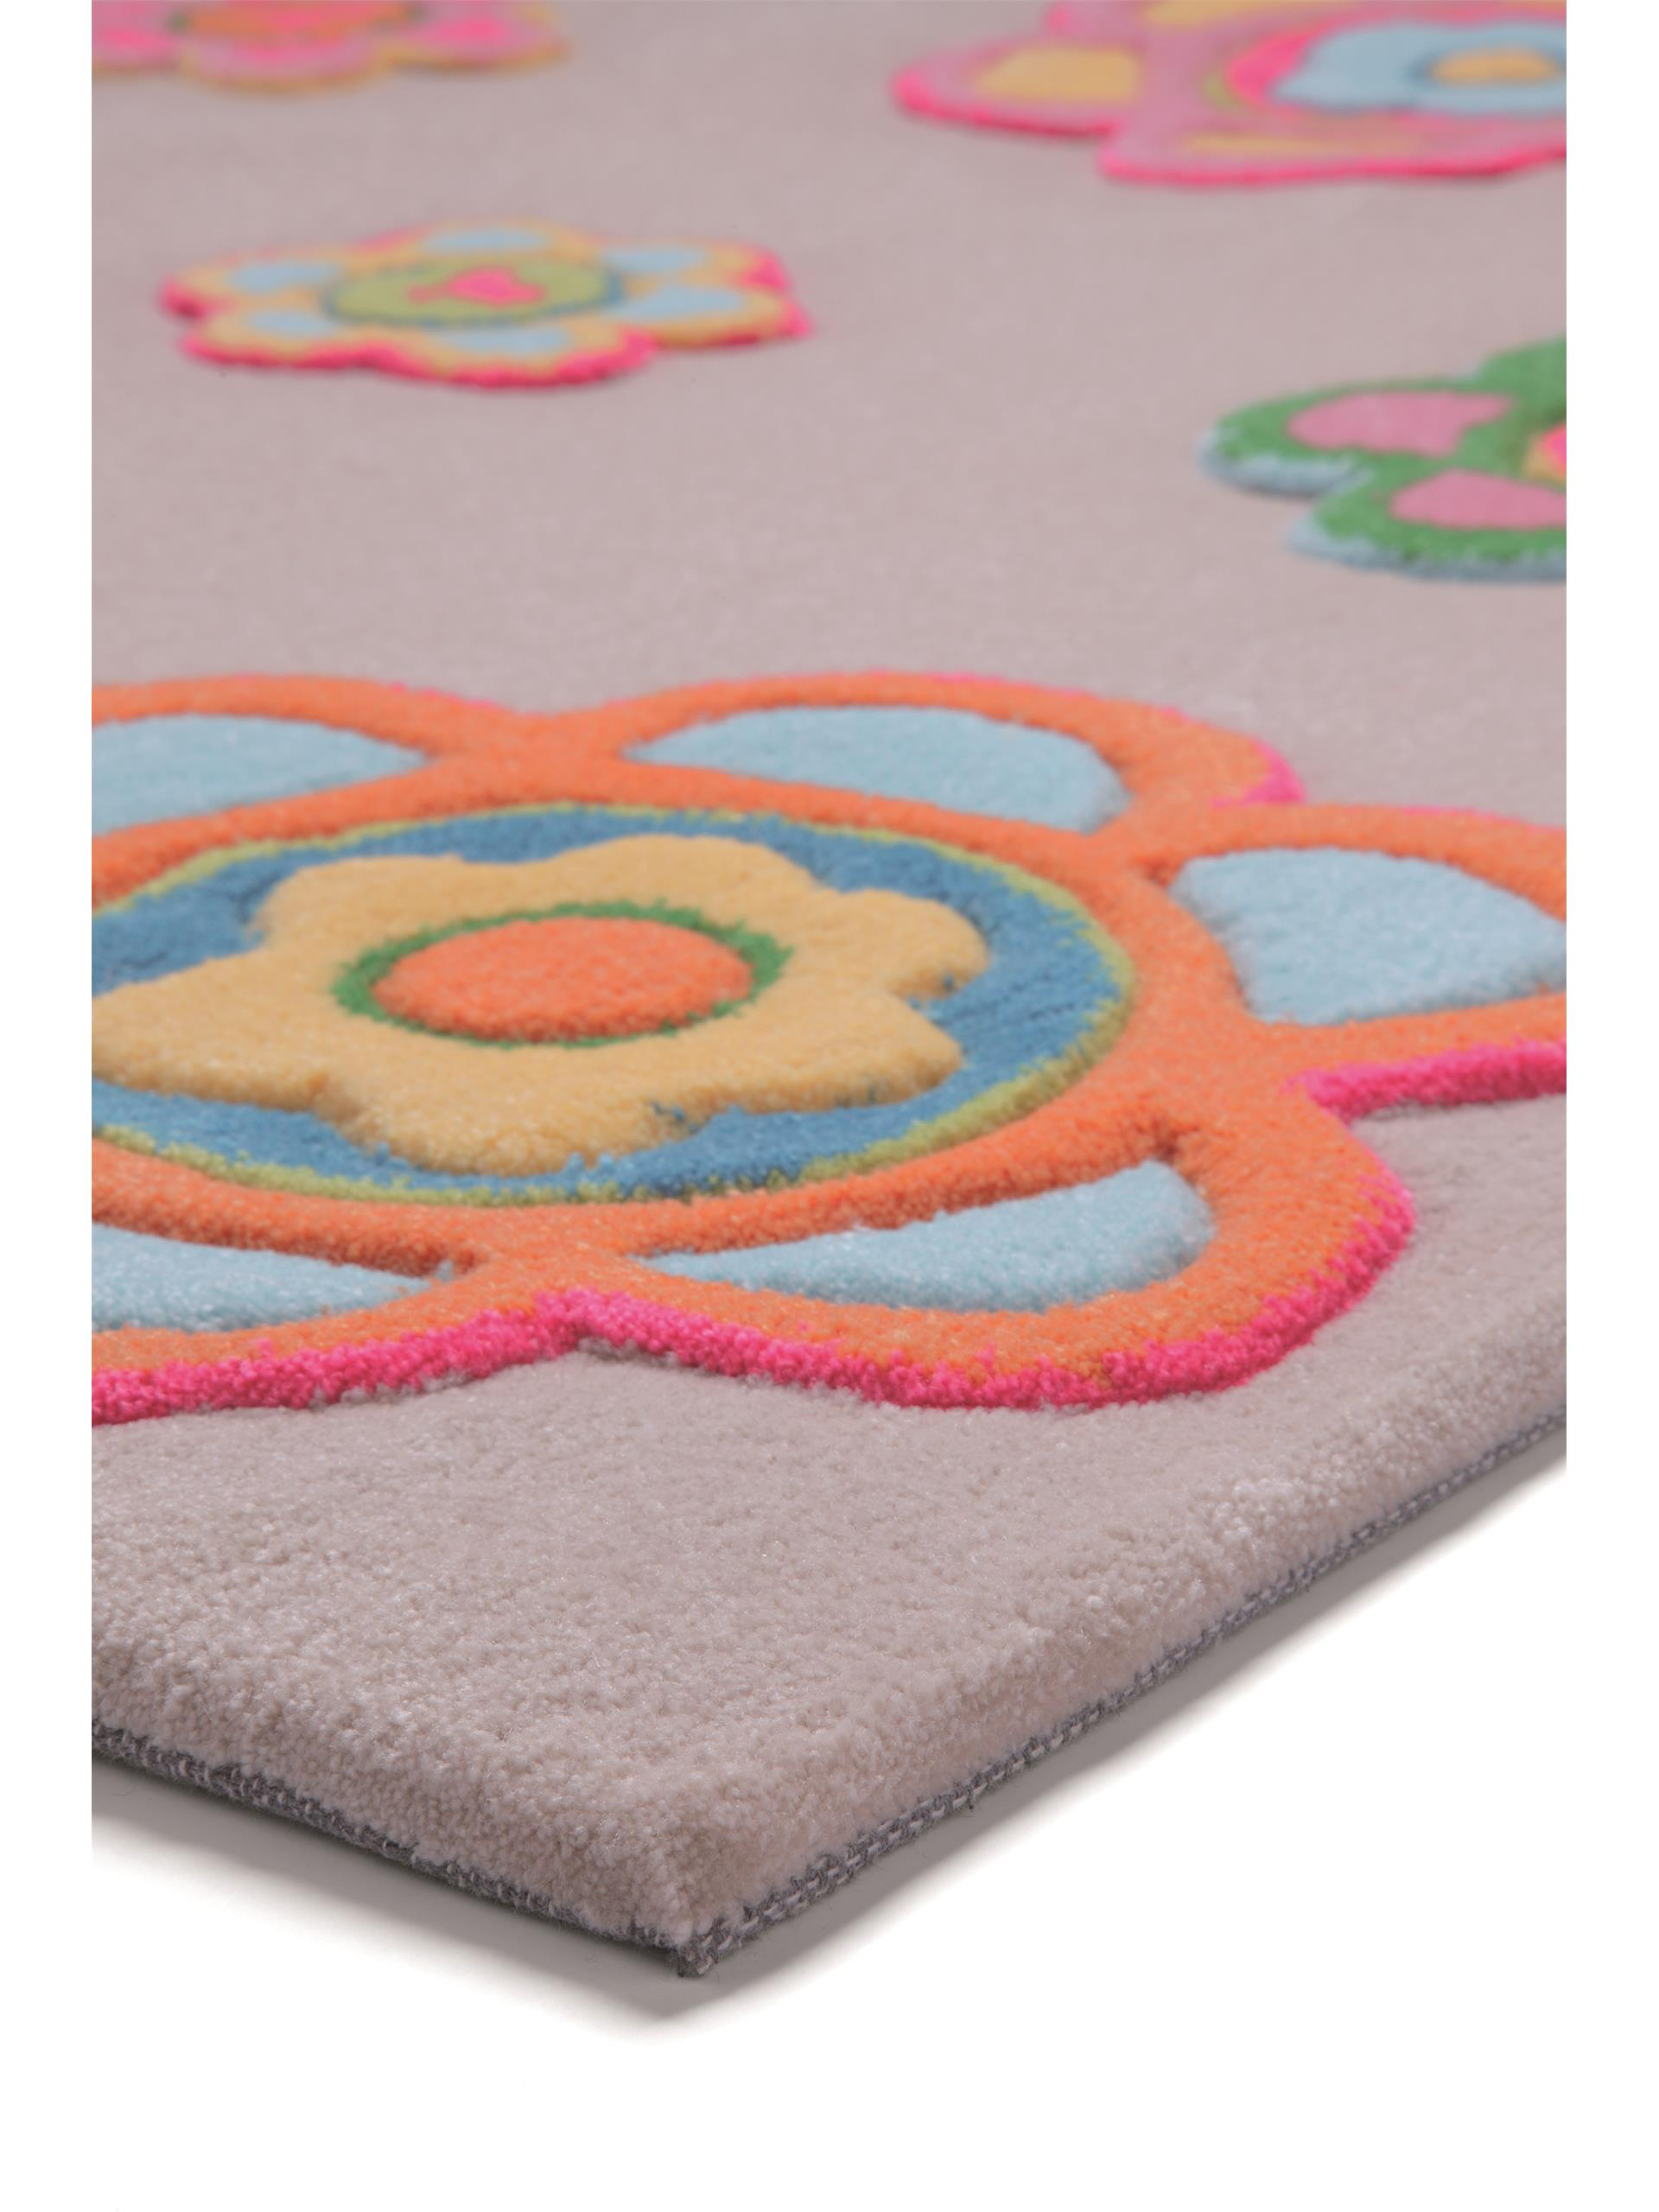 Esprit Kid's rug Back To Flower Power Multicolour 140x200 cm